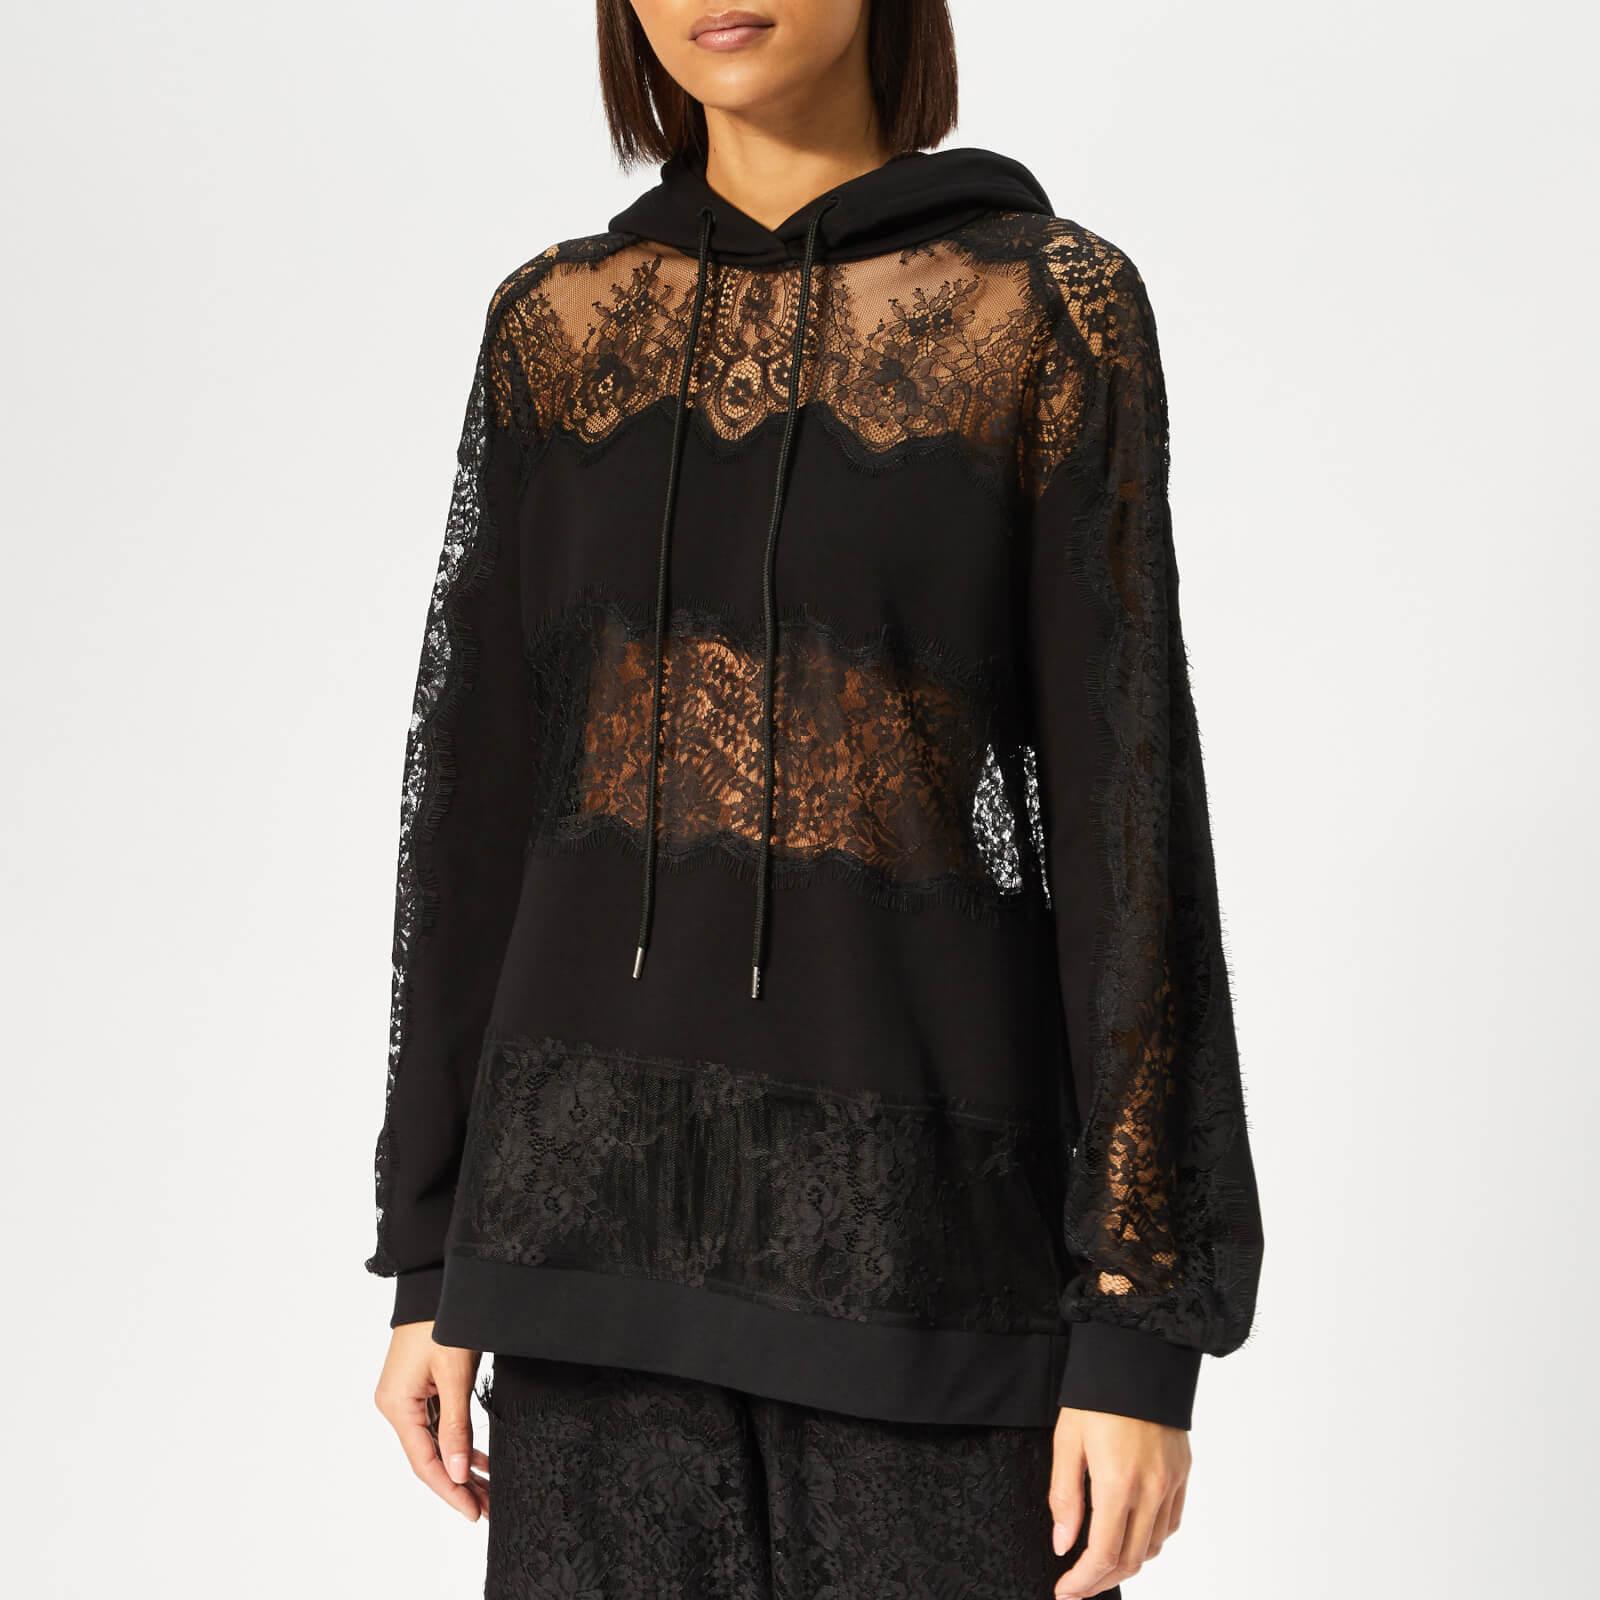 88091f70 McQ Alexander McQueen Women's Lace Stripe Hoody - Darkest Black - Free UK  Delivery over £50